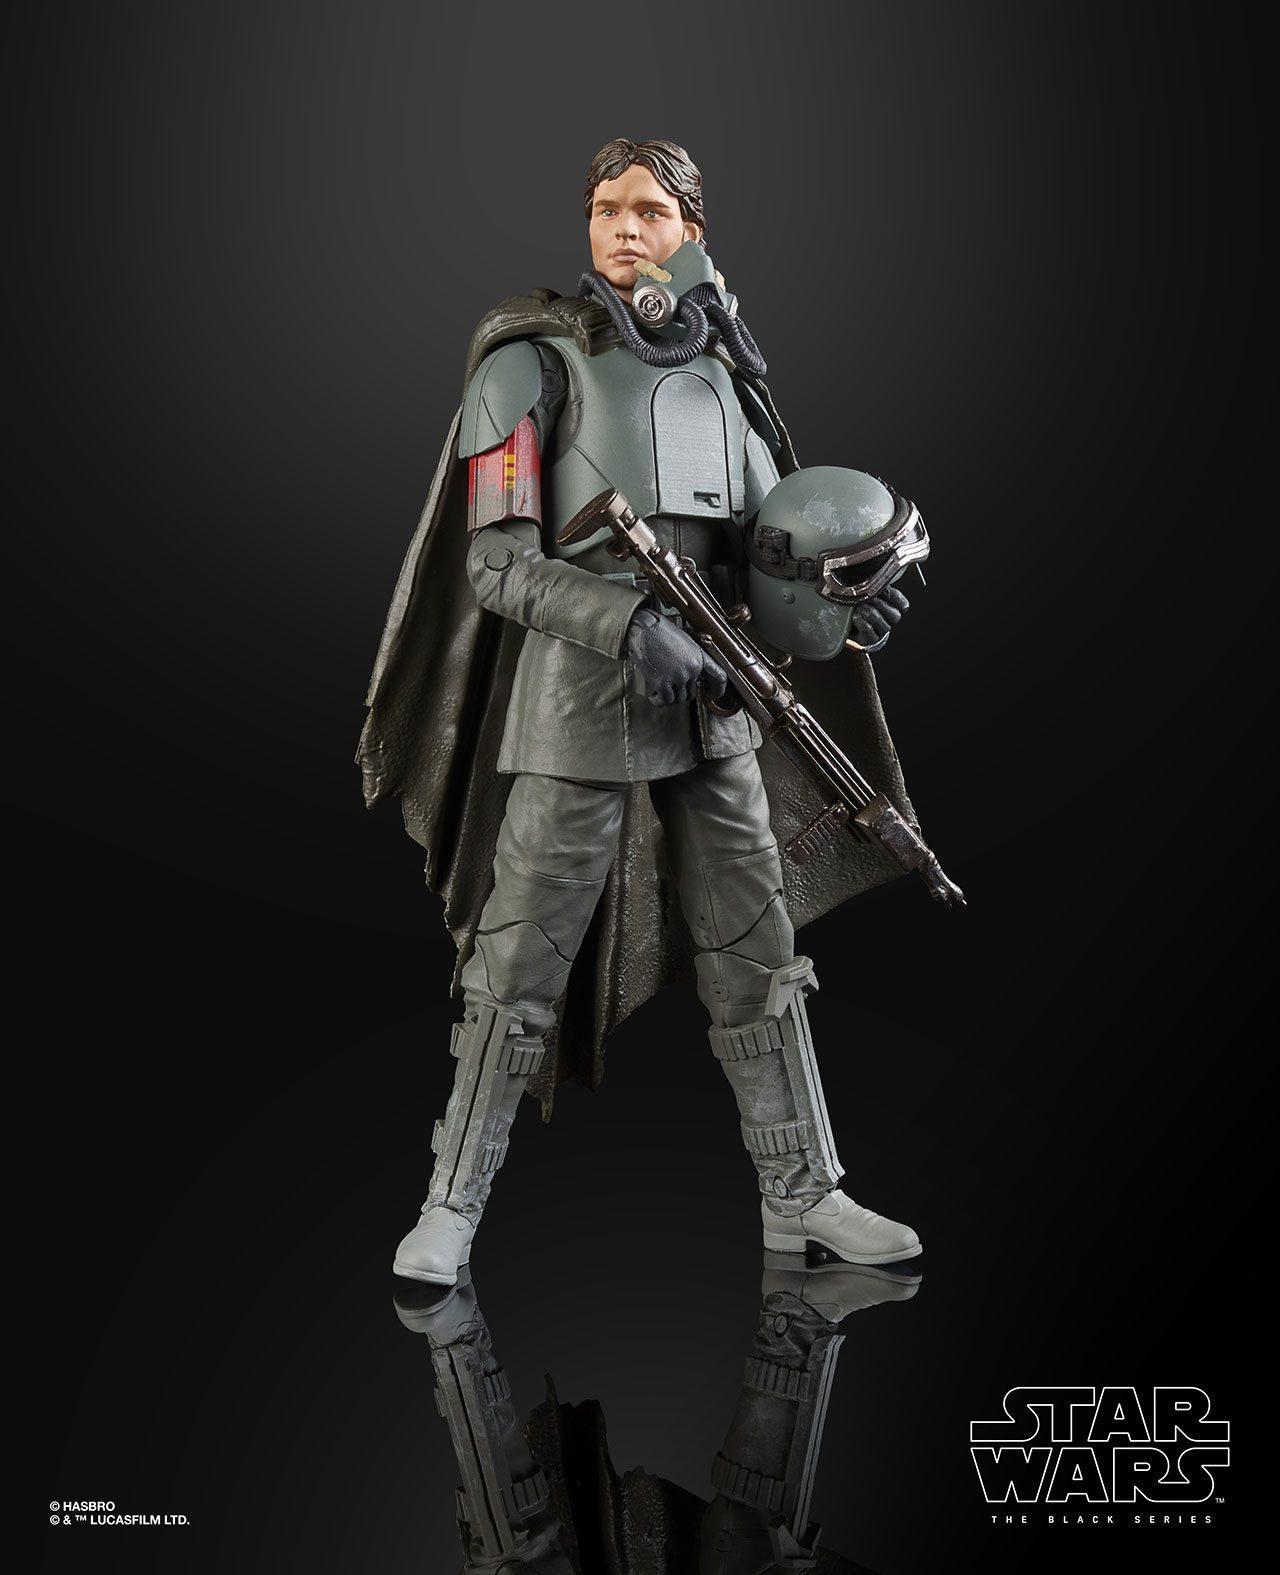 STAR WARS THE BLACK SERIES FIGURE Han Solo Mimban (1)